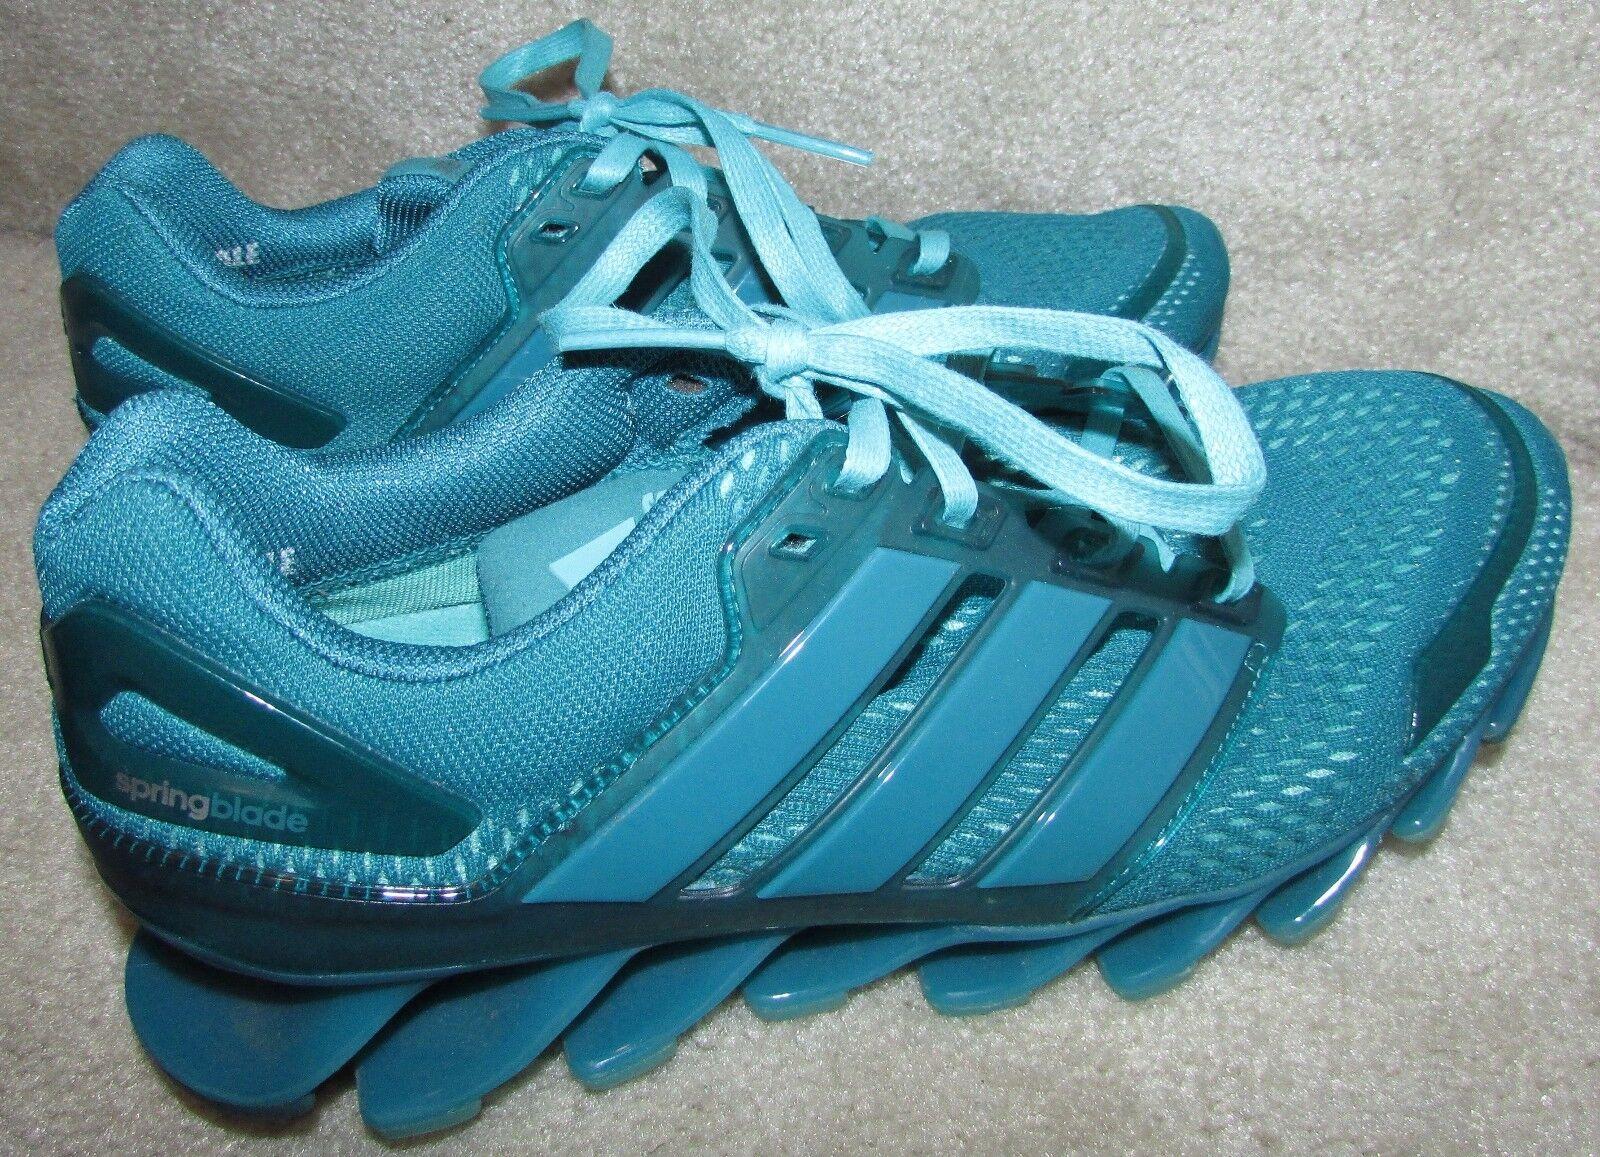 Adidas donne springblade drive 2 till campione di donne Adidas scarpe taglia 7 c75668 36d907